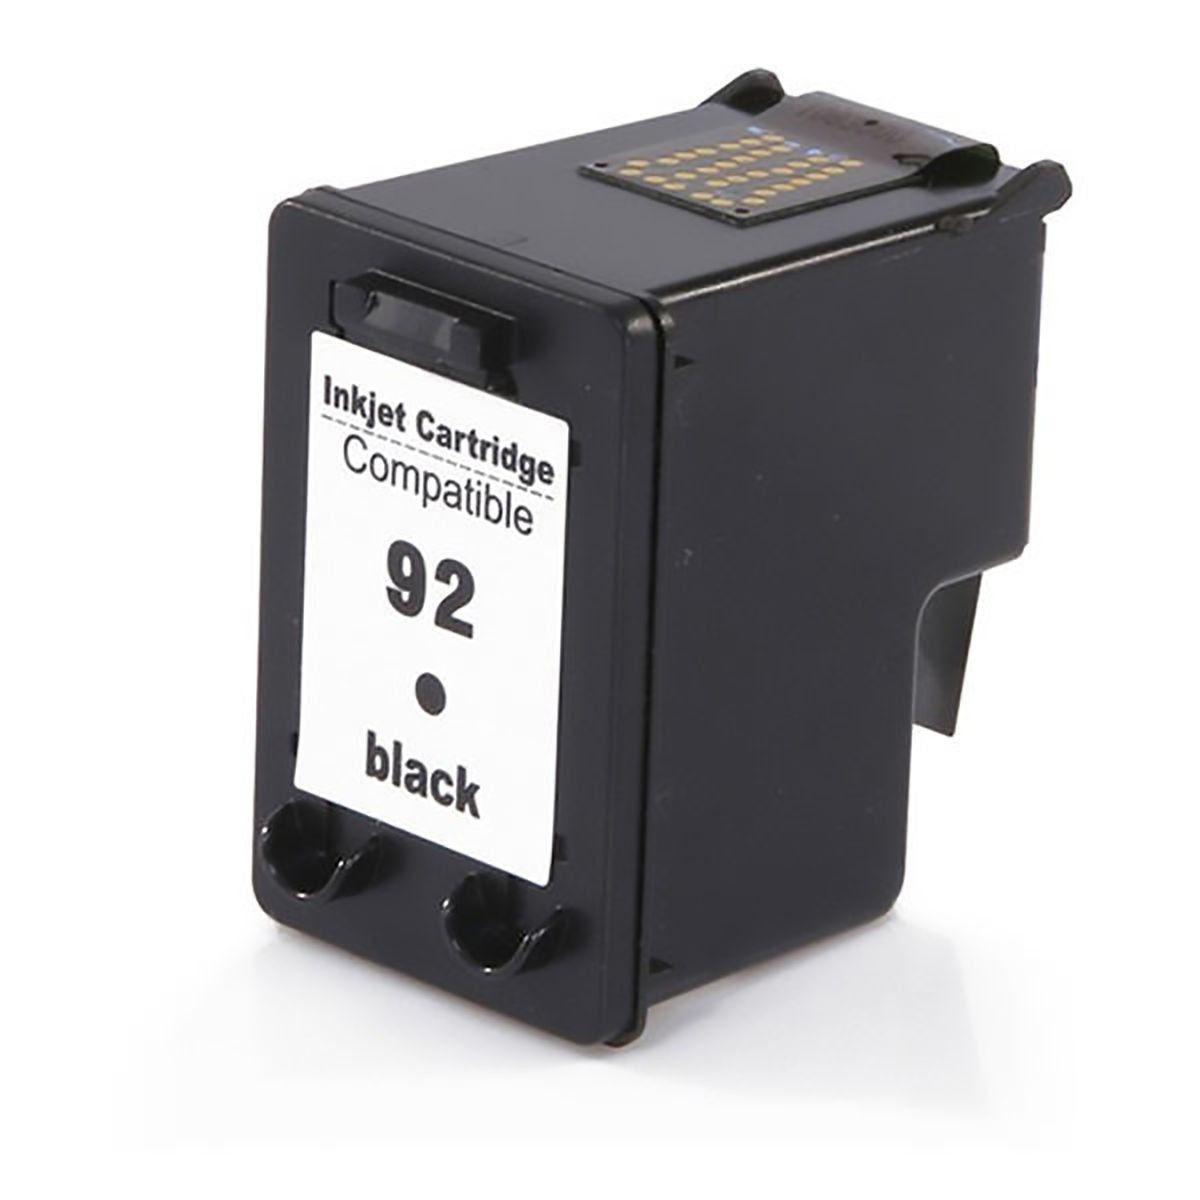 Cartucho MC Premium Inkjet Cartridge 92 Black 10ml